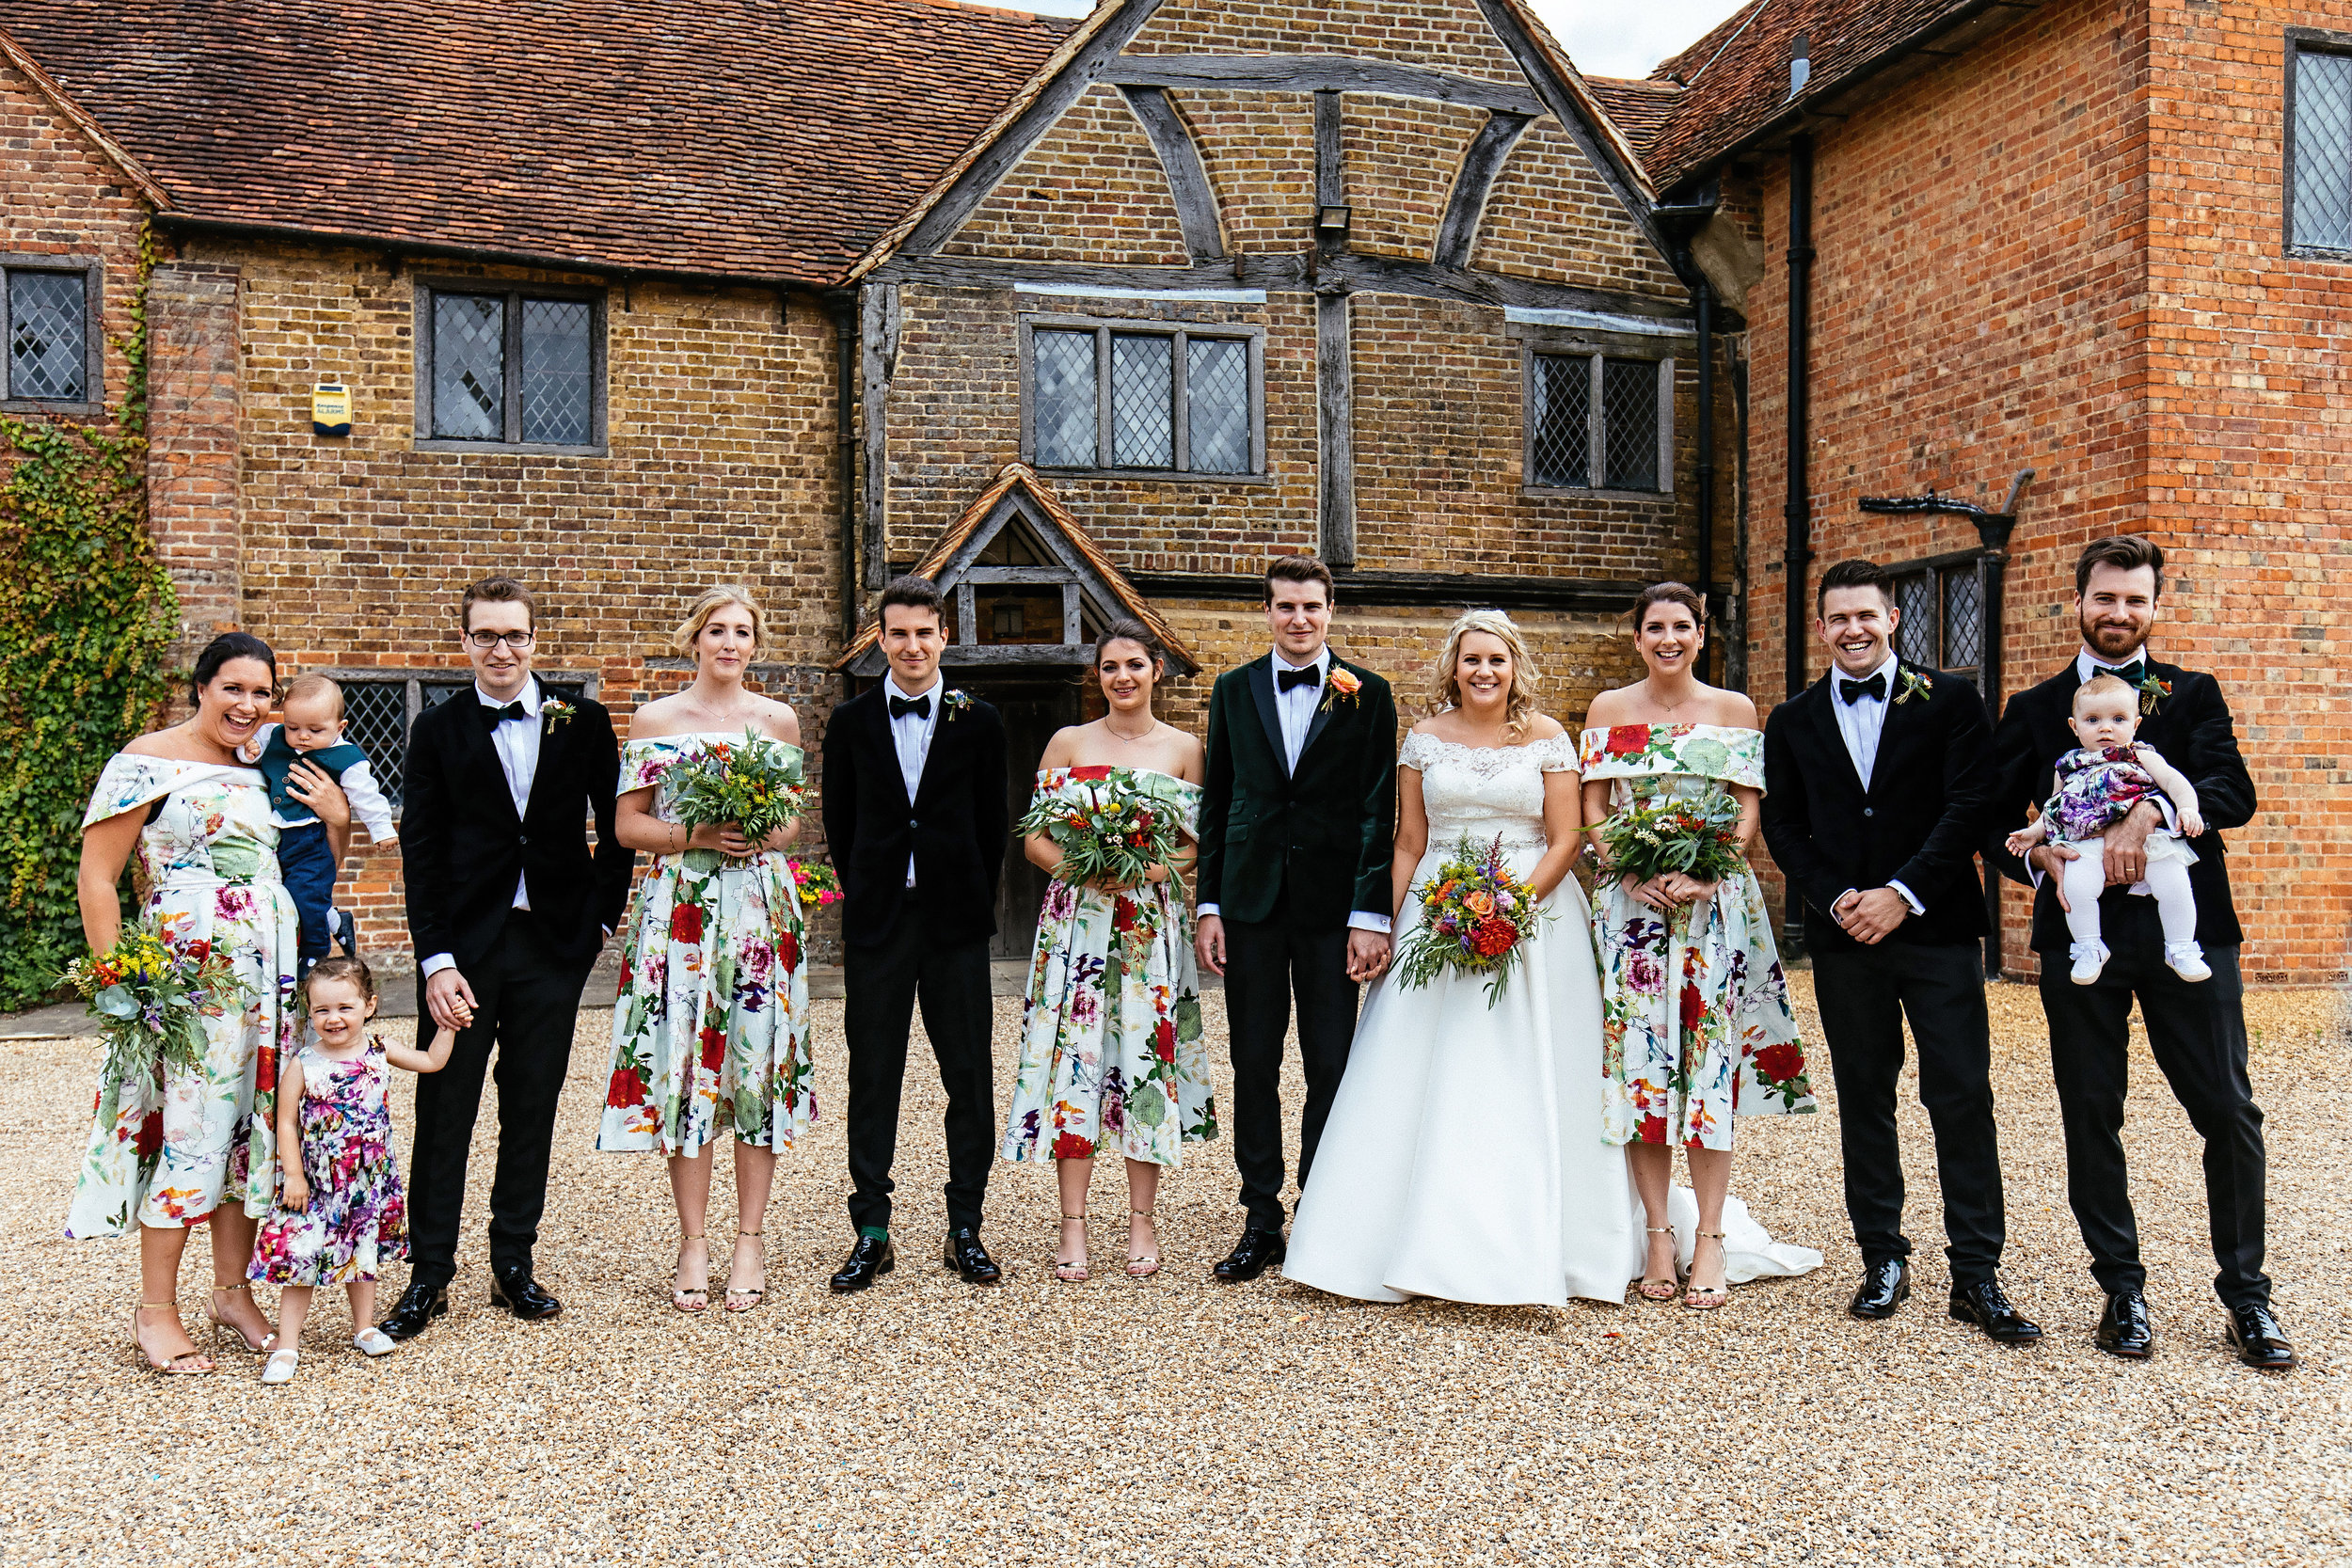 Tamara-and-Richard-Wedding-Highlights-40.jpg